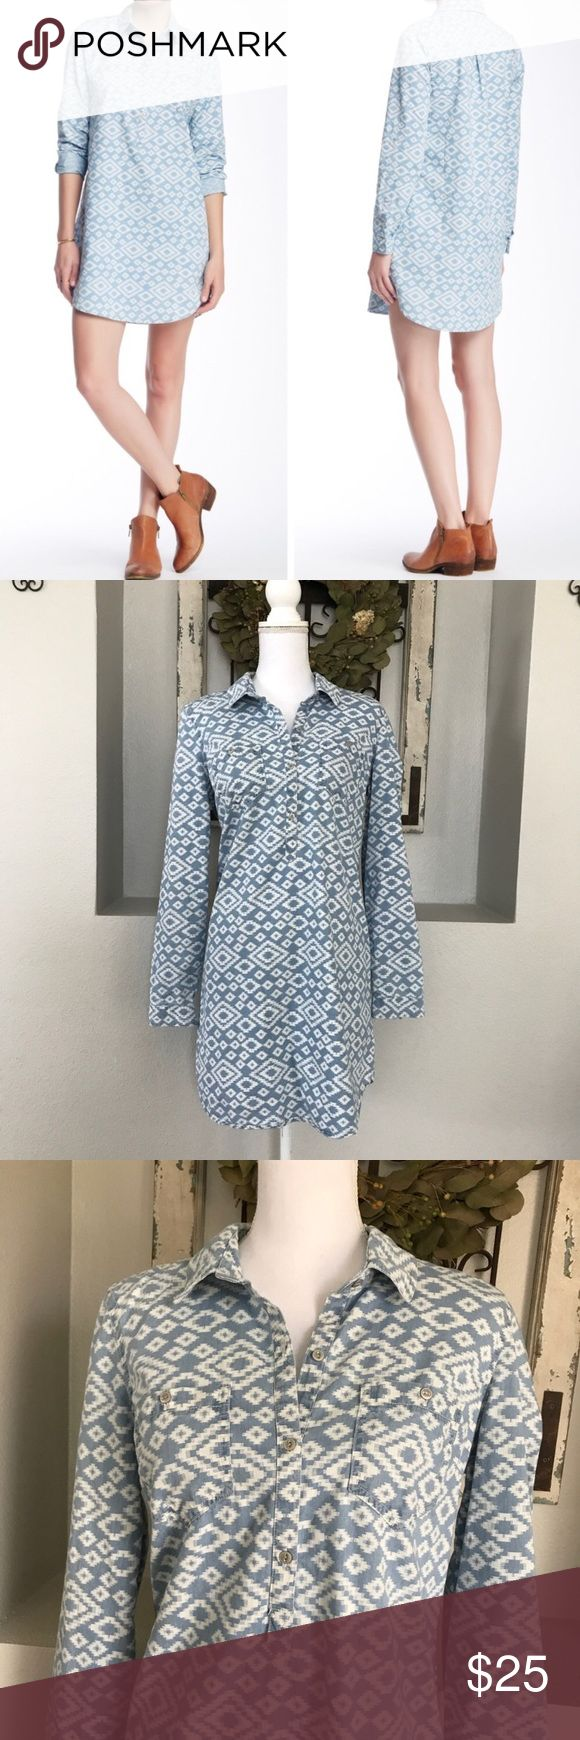 Lucky Brand Ikat Chambray Shirt Dress Lucky Brand Ikat Chambray Shirt Dress - Size medium. Excellent condition. Lucky Brand Dresses Midi